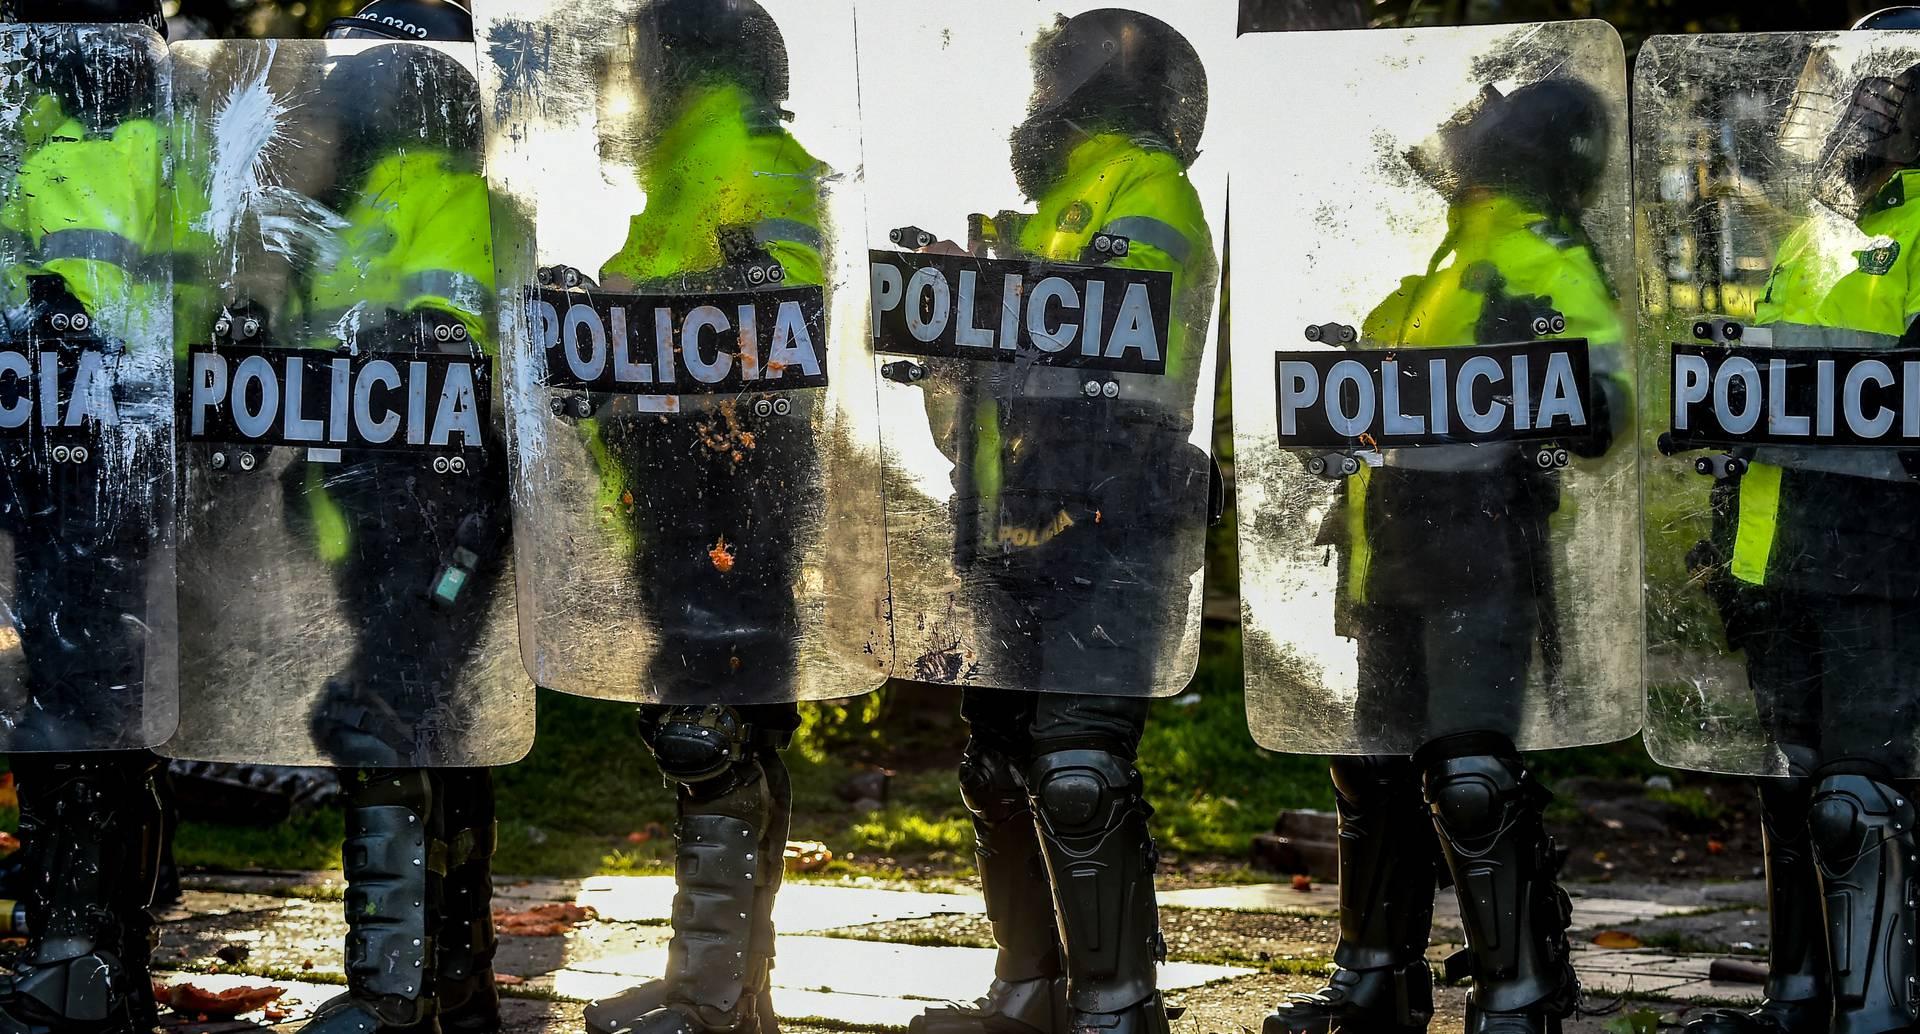 Policía en Bogotá durante protestas